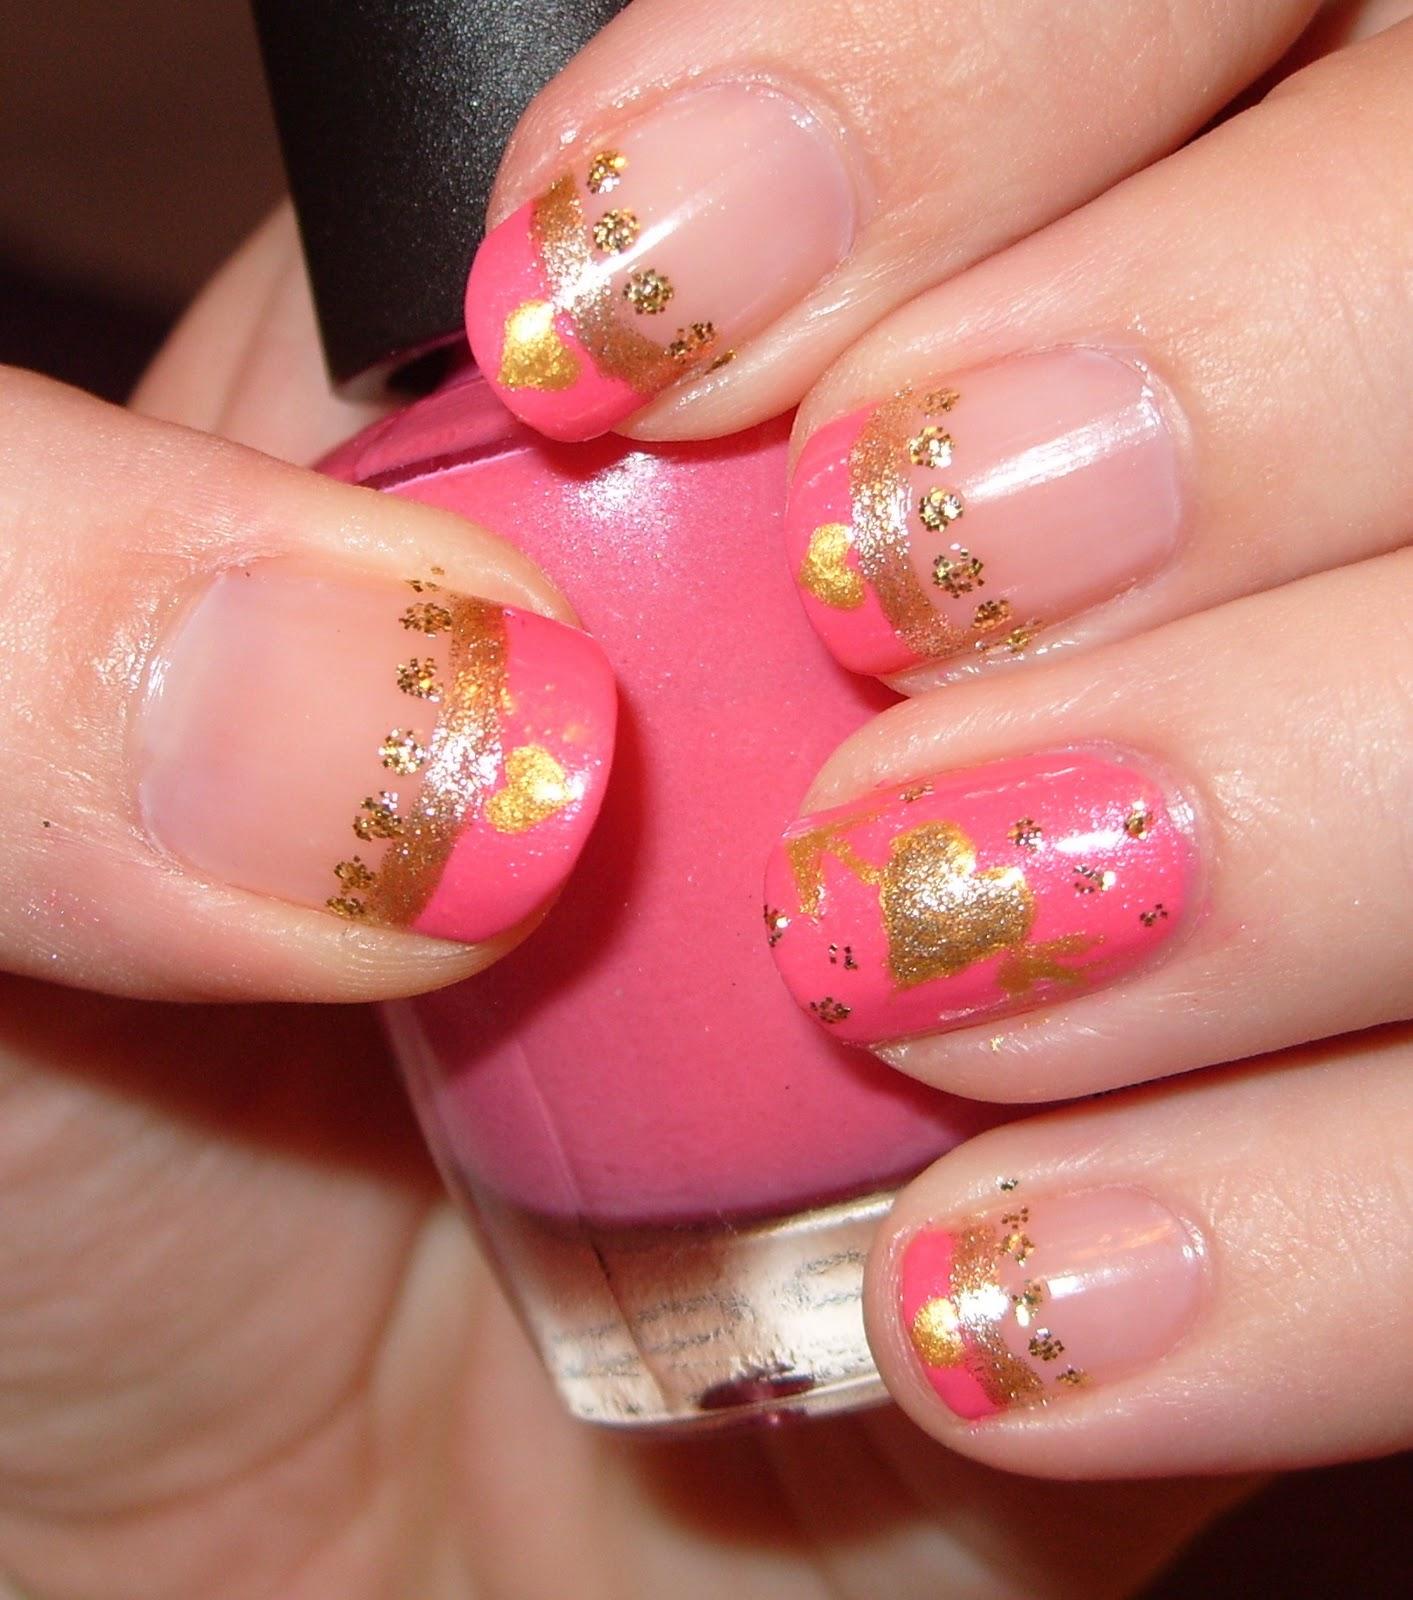 Cupid nail art nails gallery cupid nail art hd gallery prinsesfo Images